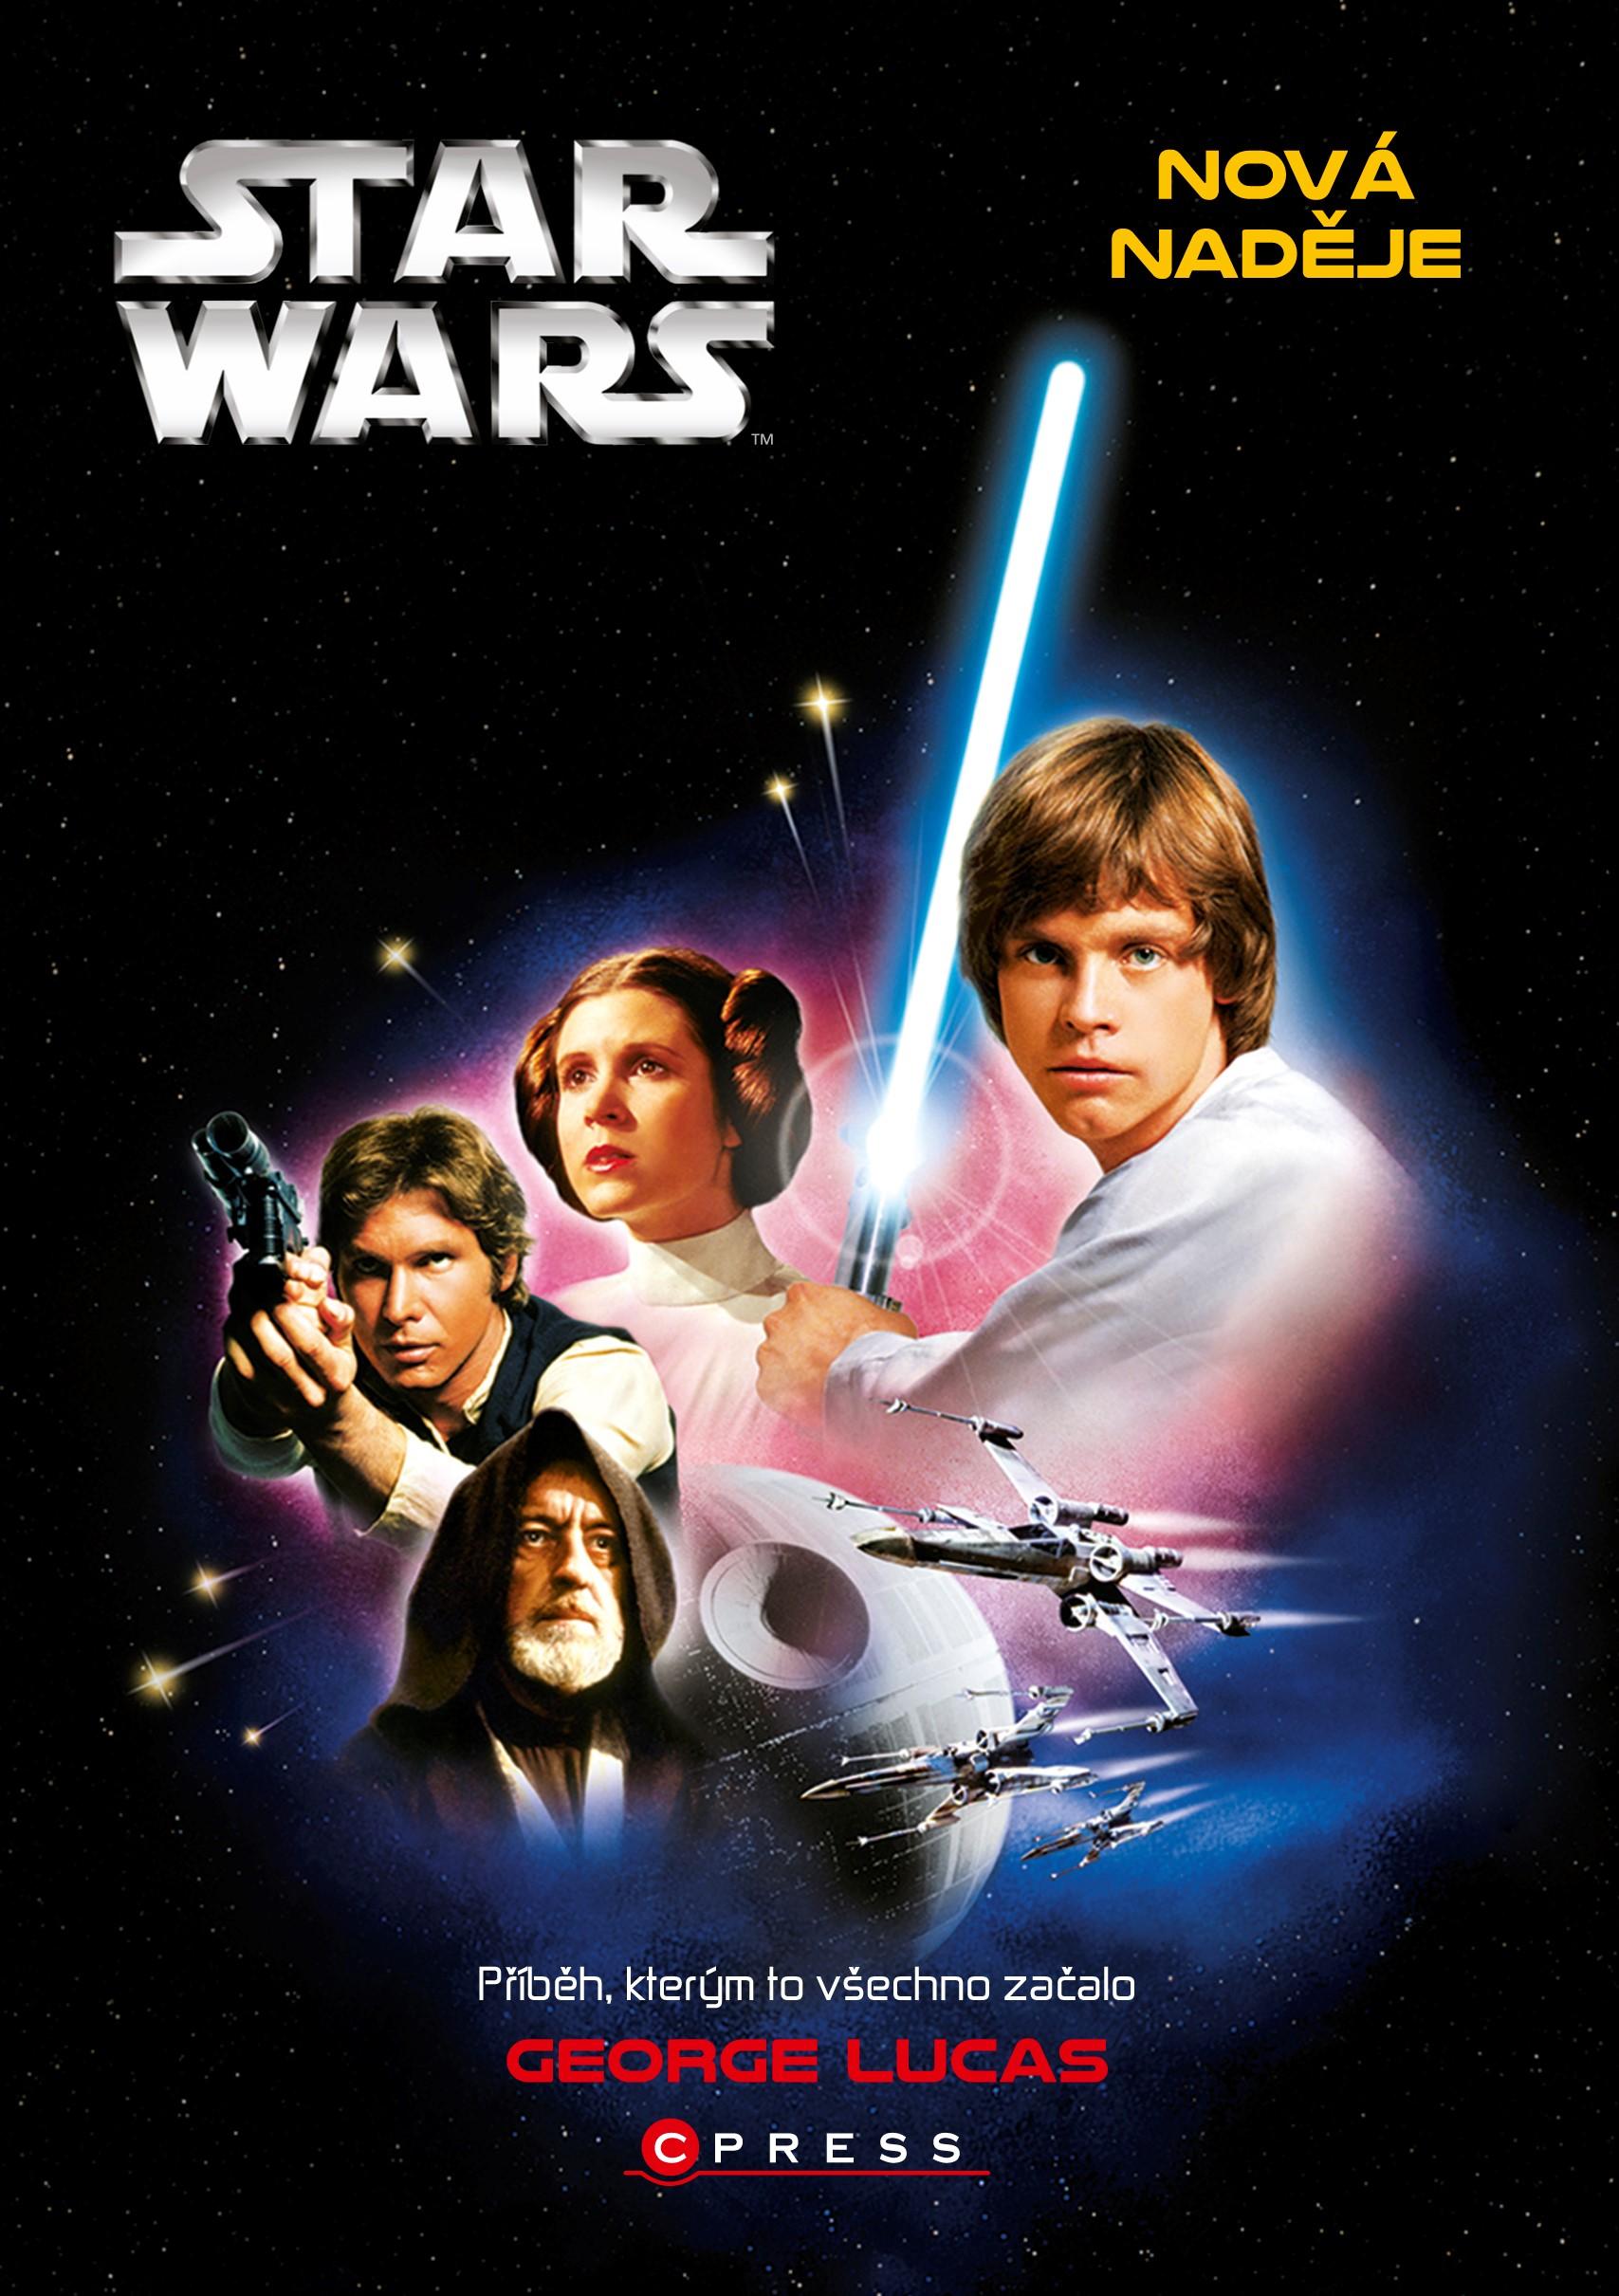 Star Wars: Nová naděje | George Lucas